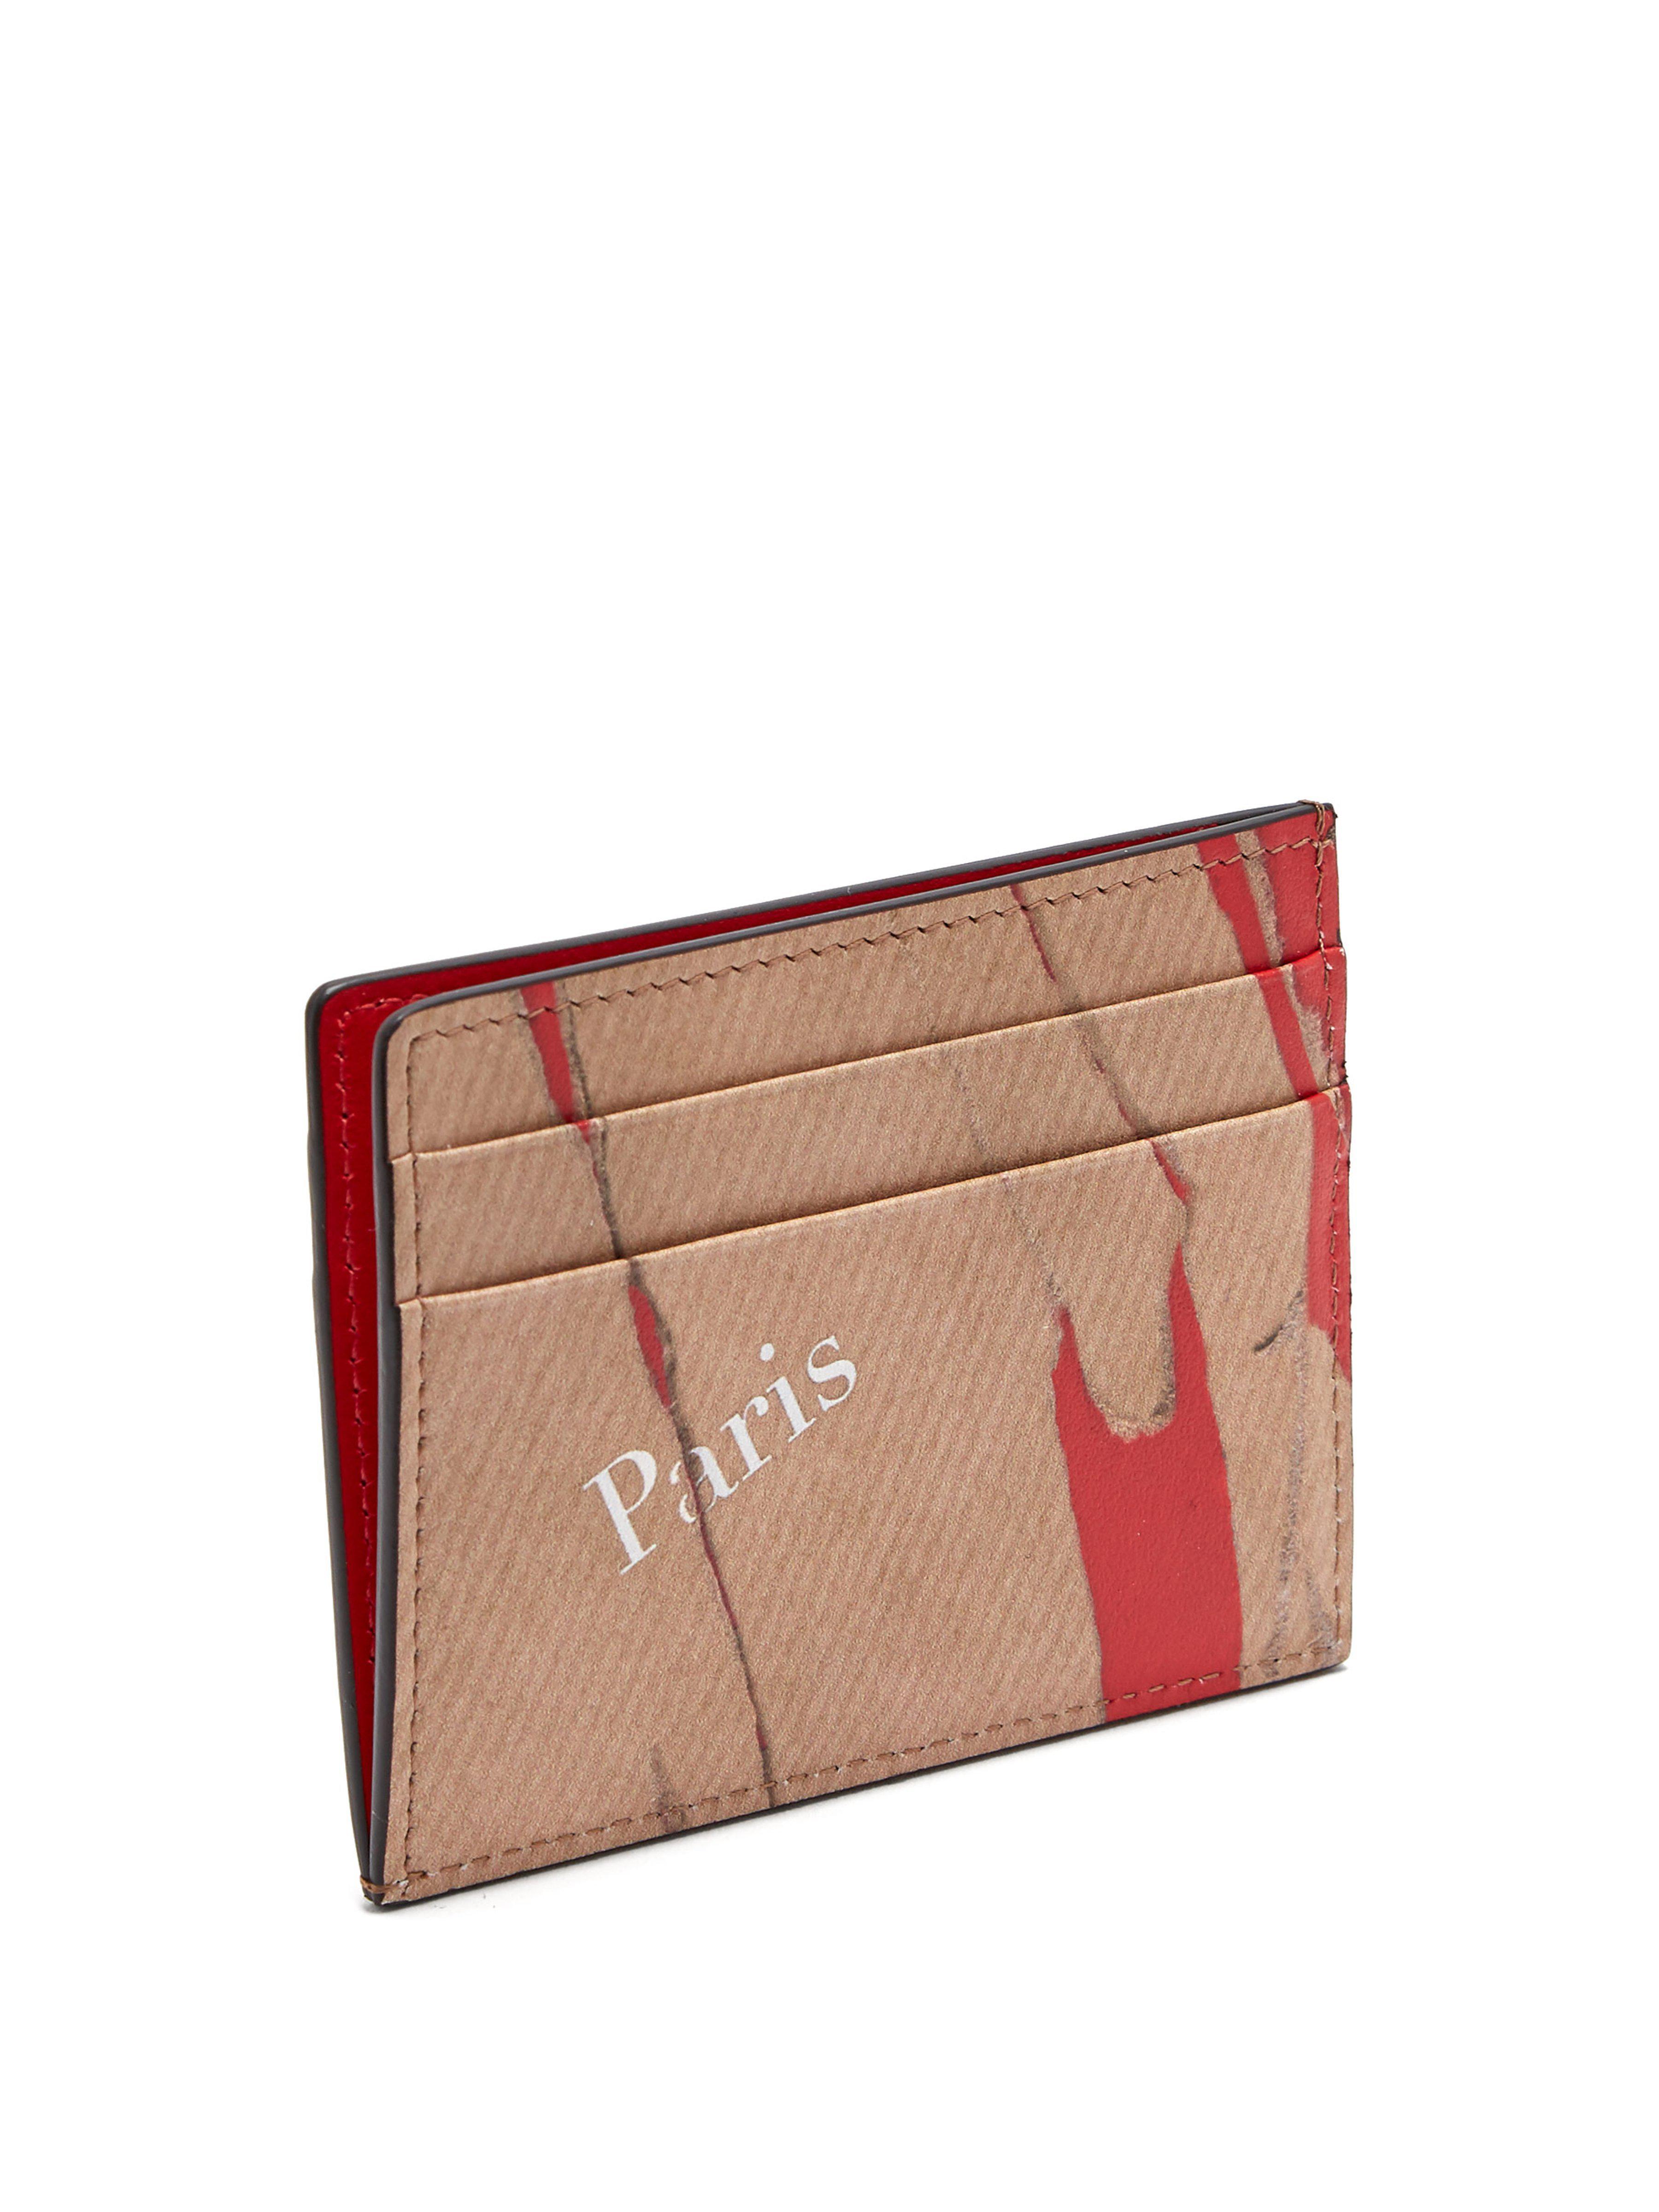 52d608c42b3 Christian Louboutin Kraft Kios Smooth Leather Cardholder in Natural ...